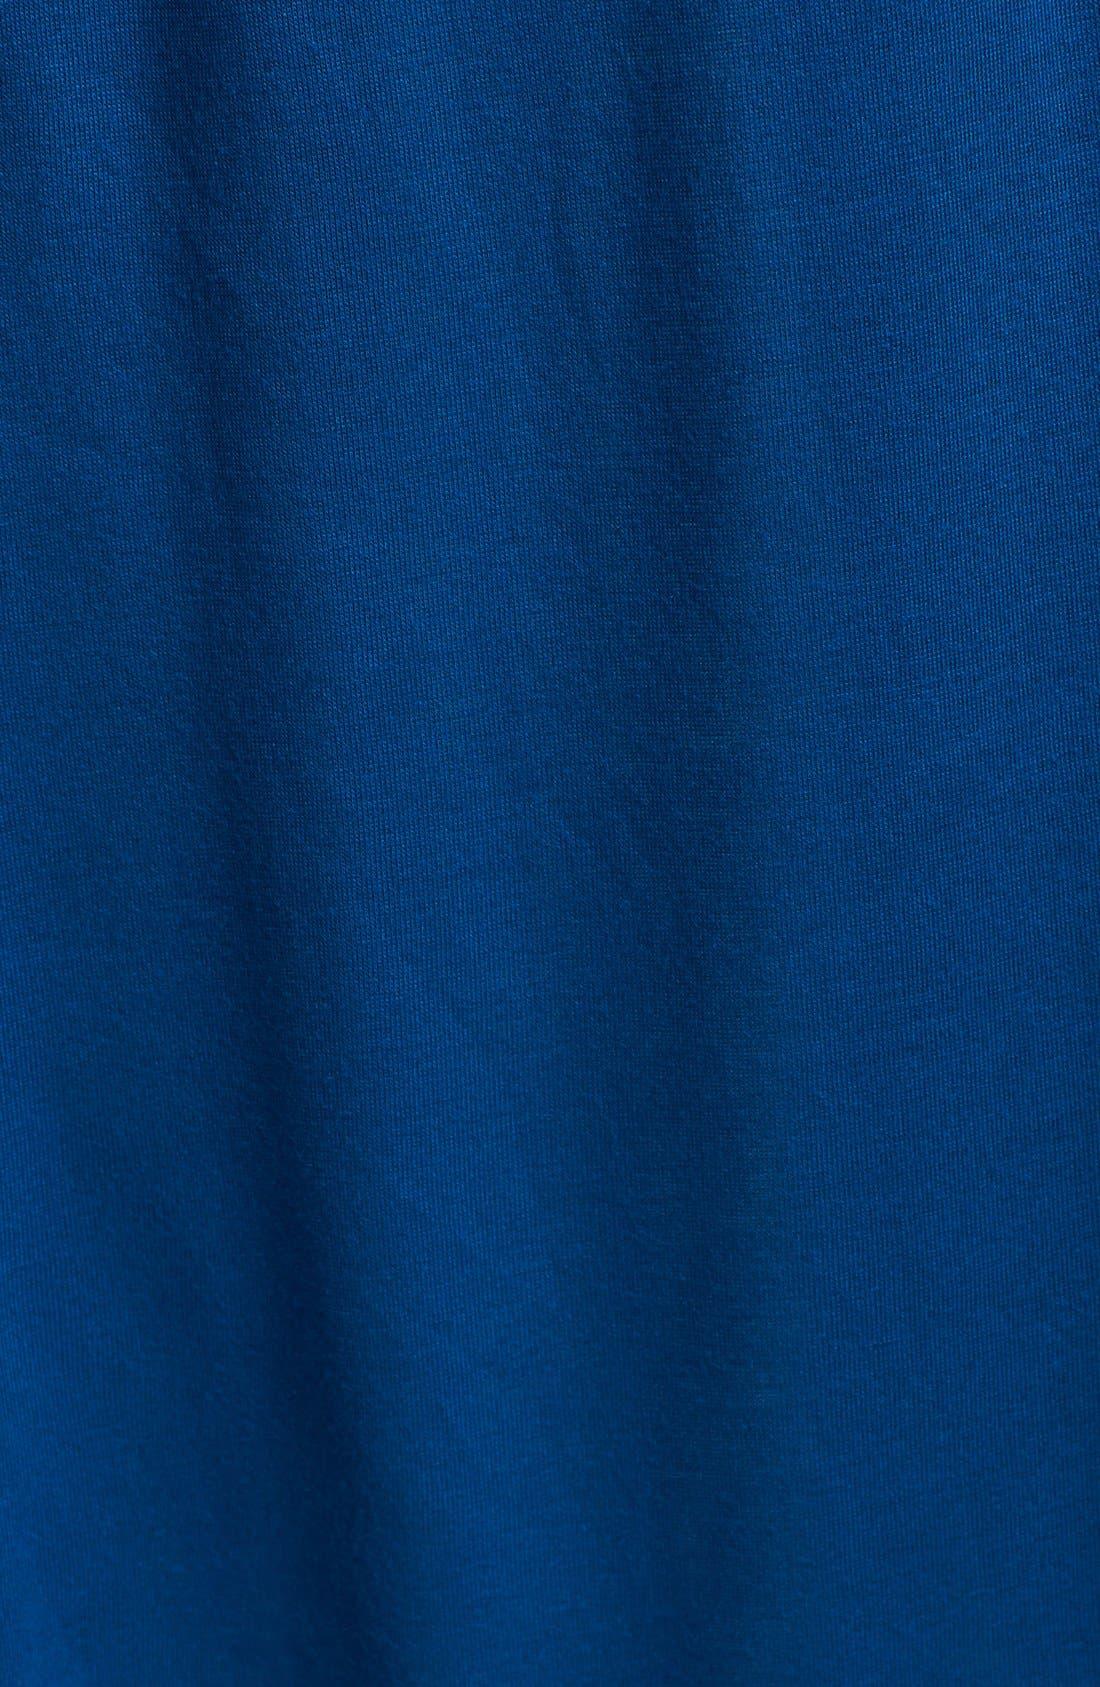 'Colette' Nightgown,                             Alternate thumbnail 8, color,